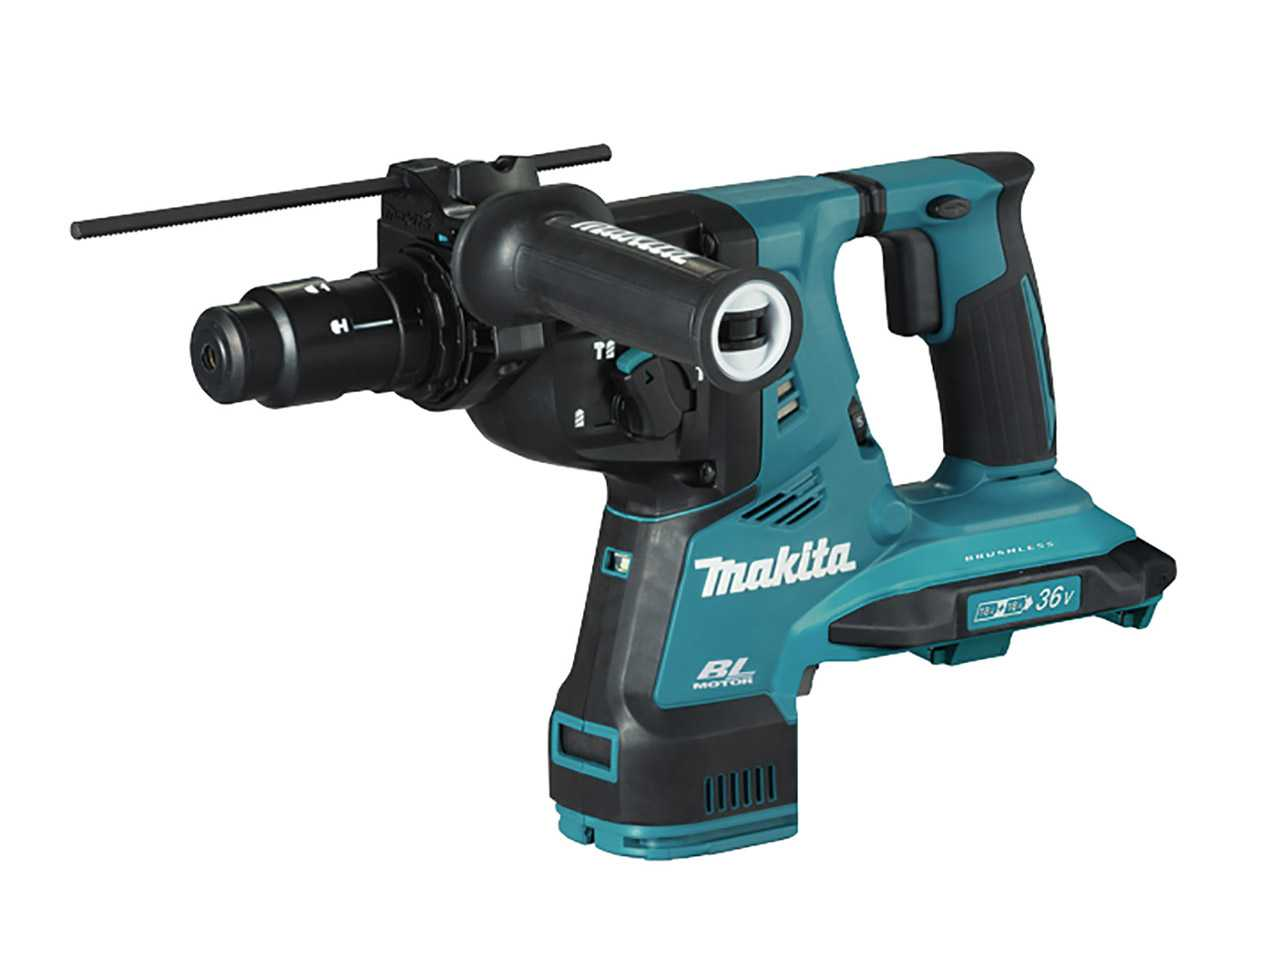 MAKITA DHP485Z 18v Combi drill 13mm keyless chuck